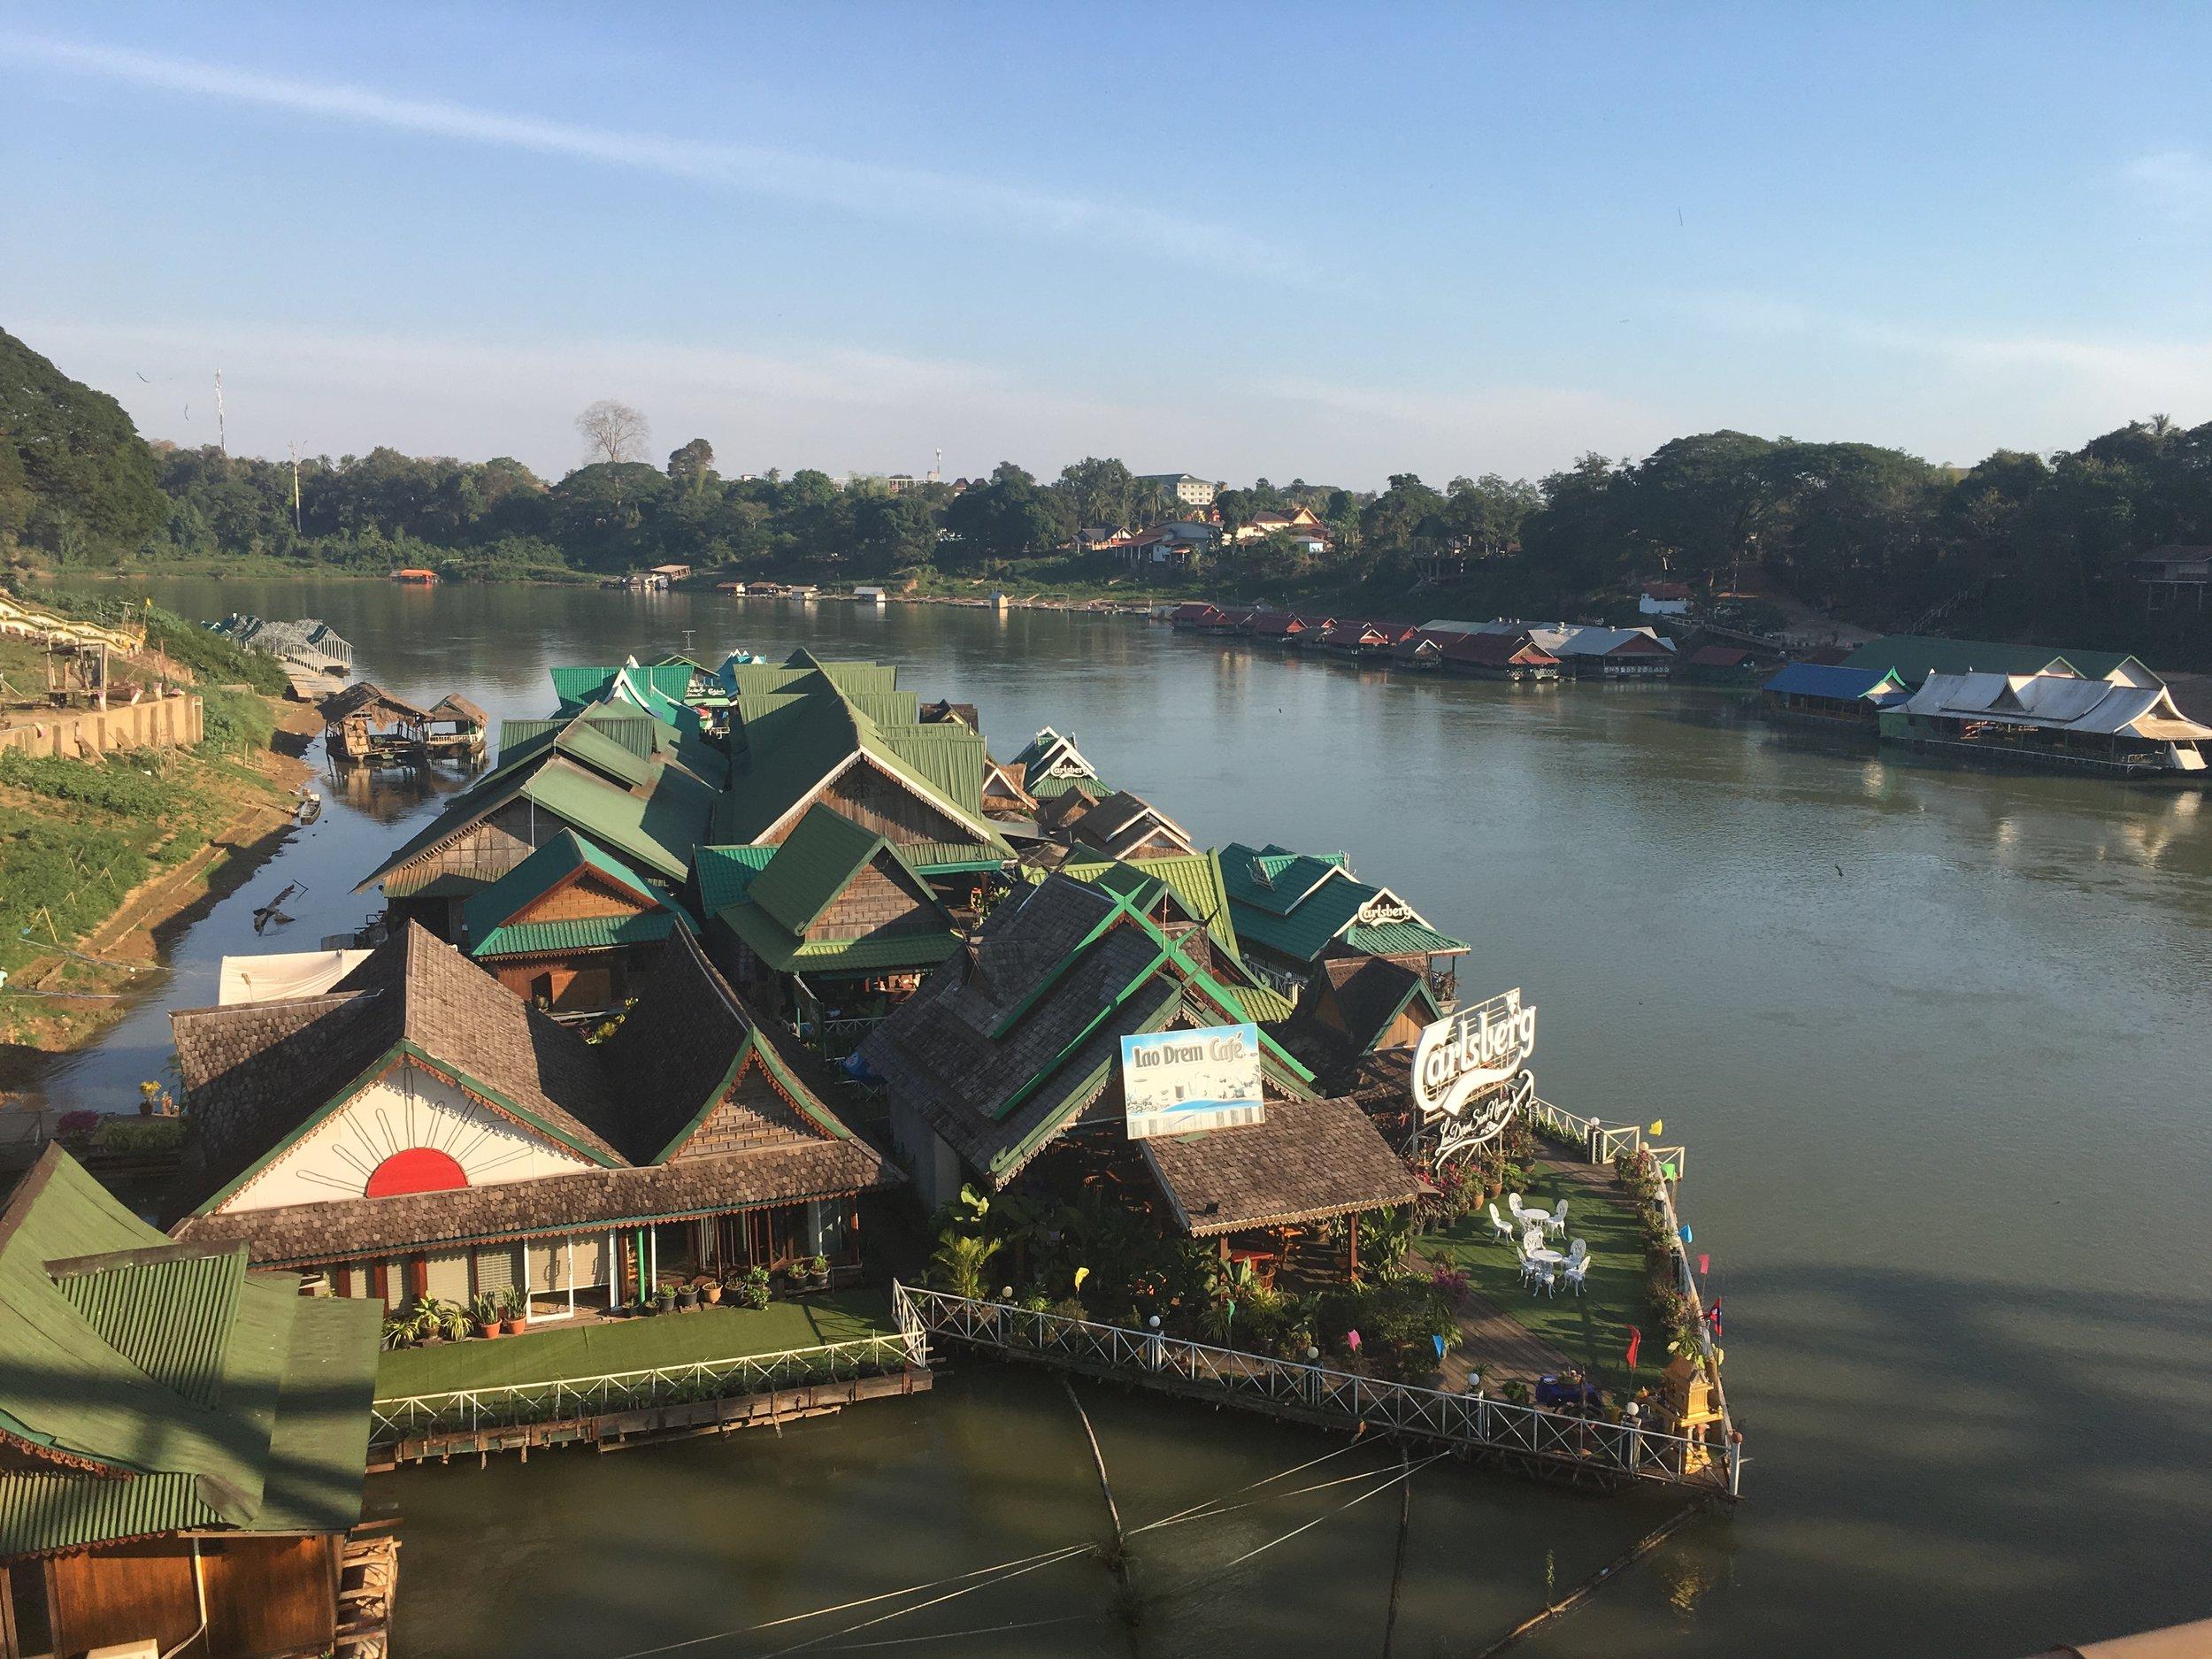 Floating restaurants in the sleepy Tha Ngon